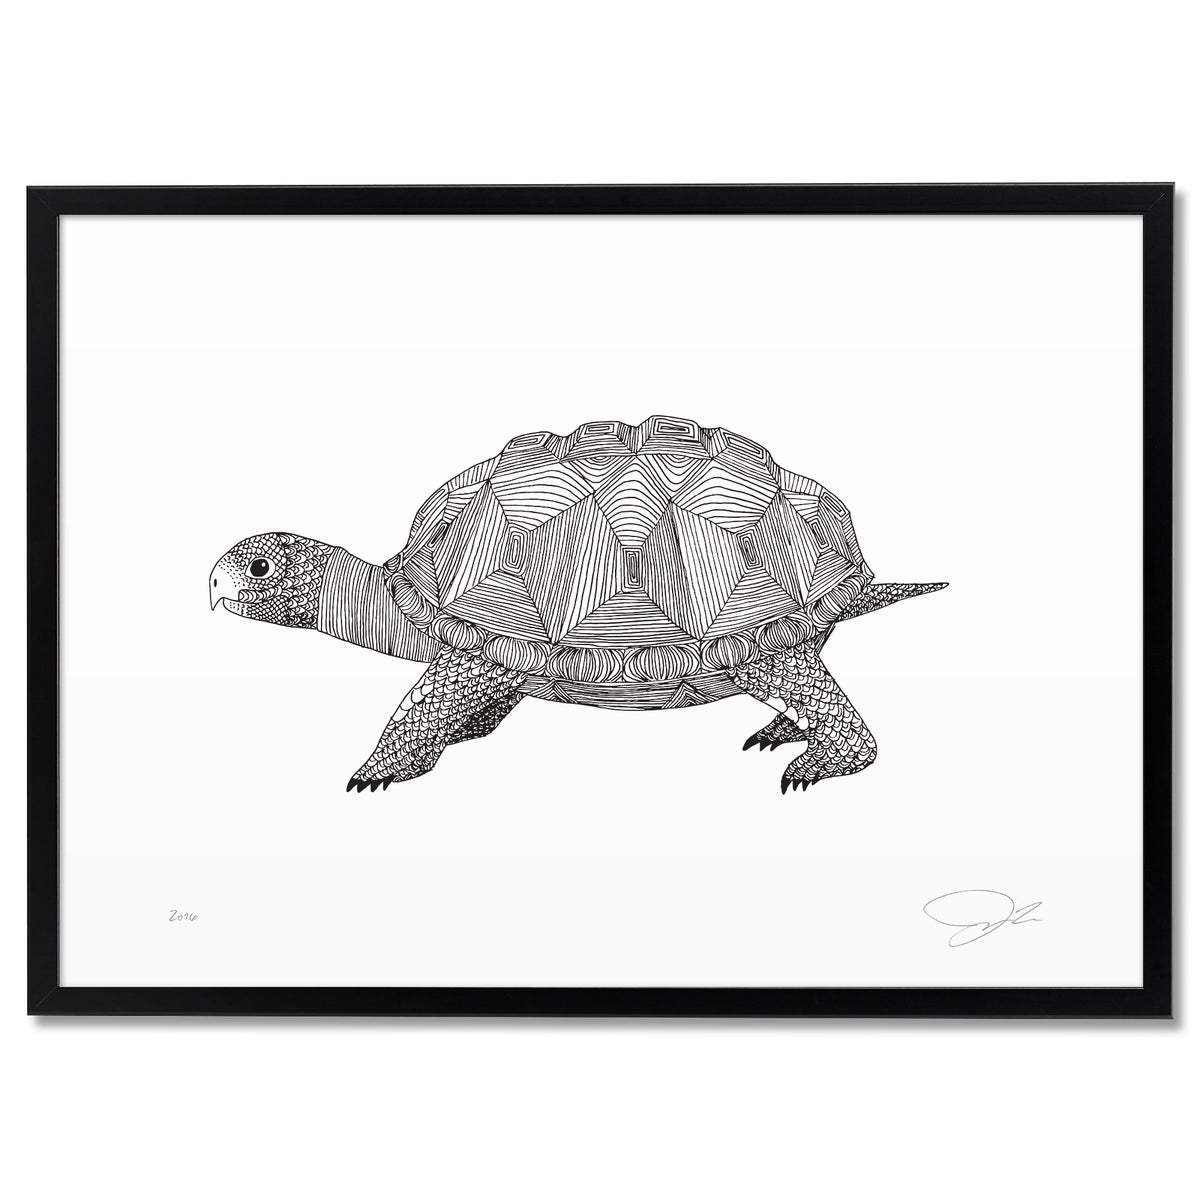 Image of Print: Tortoise